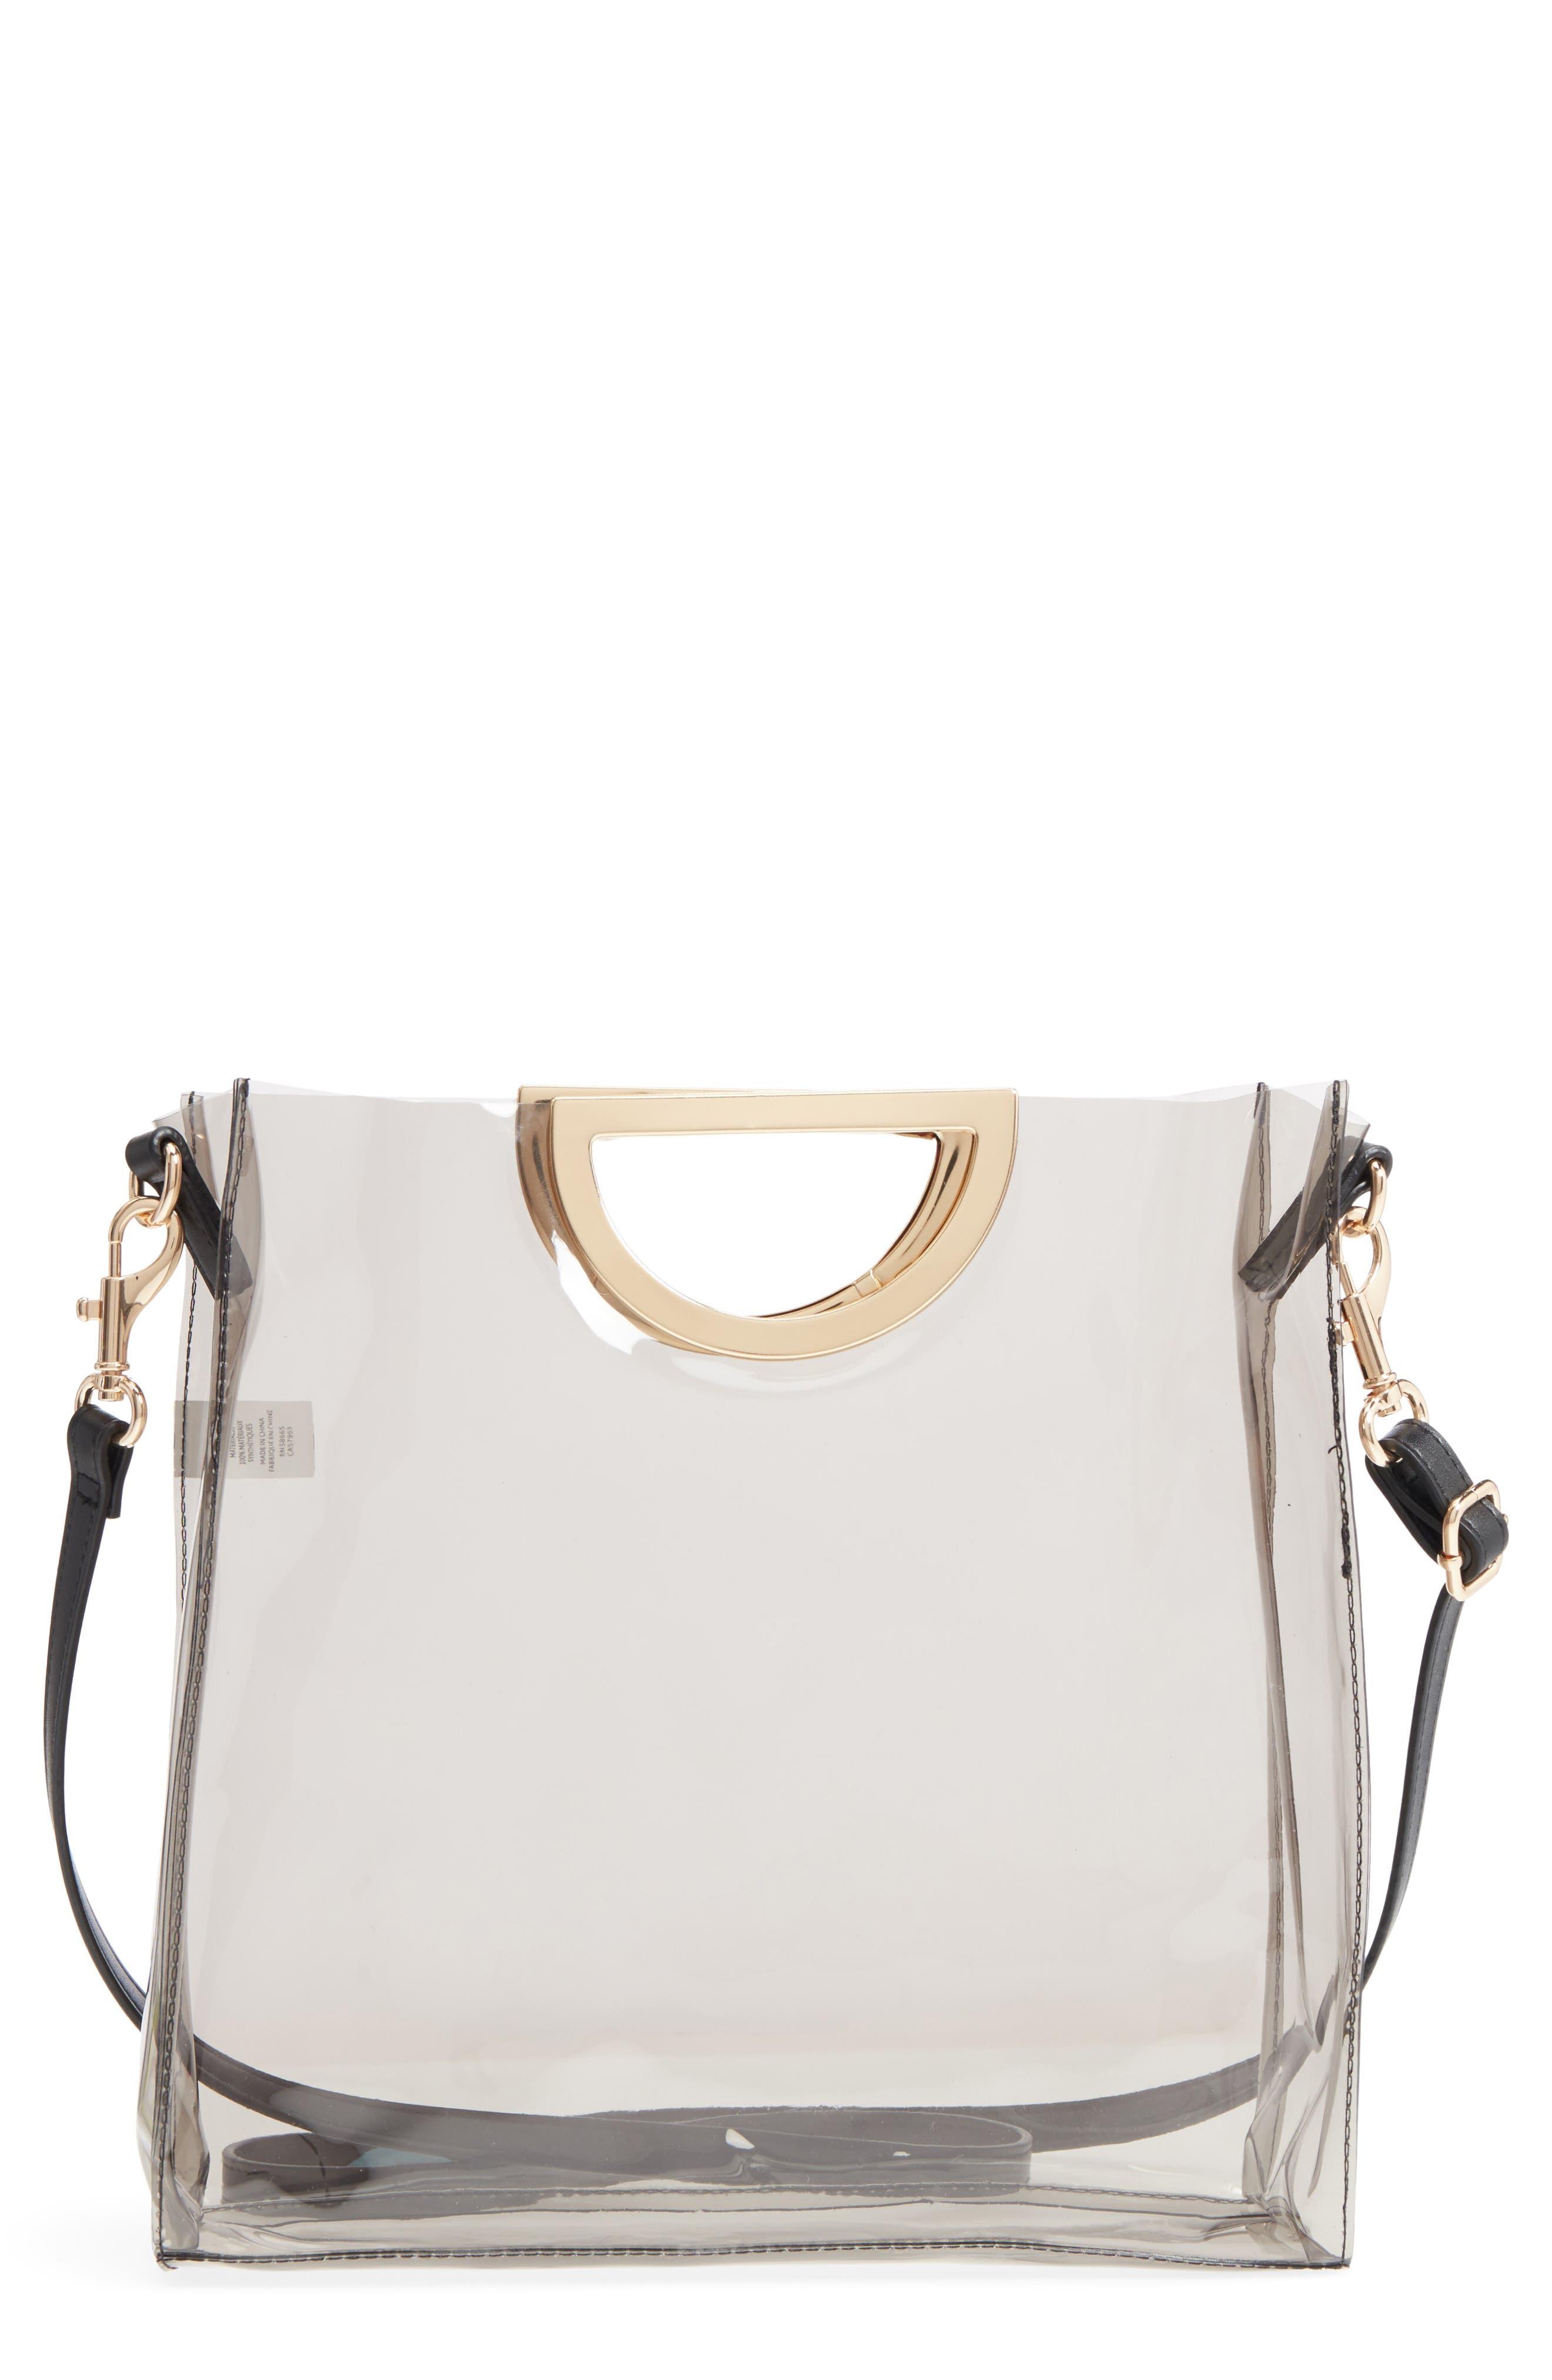 Mini Translucent Metal Handle Bag,                             Main thumbnail 1, color,                             020